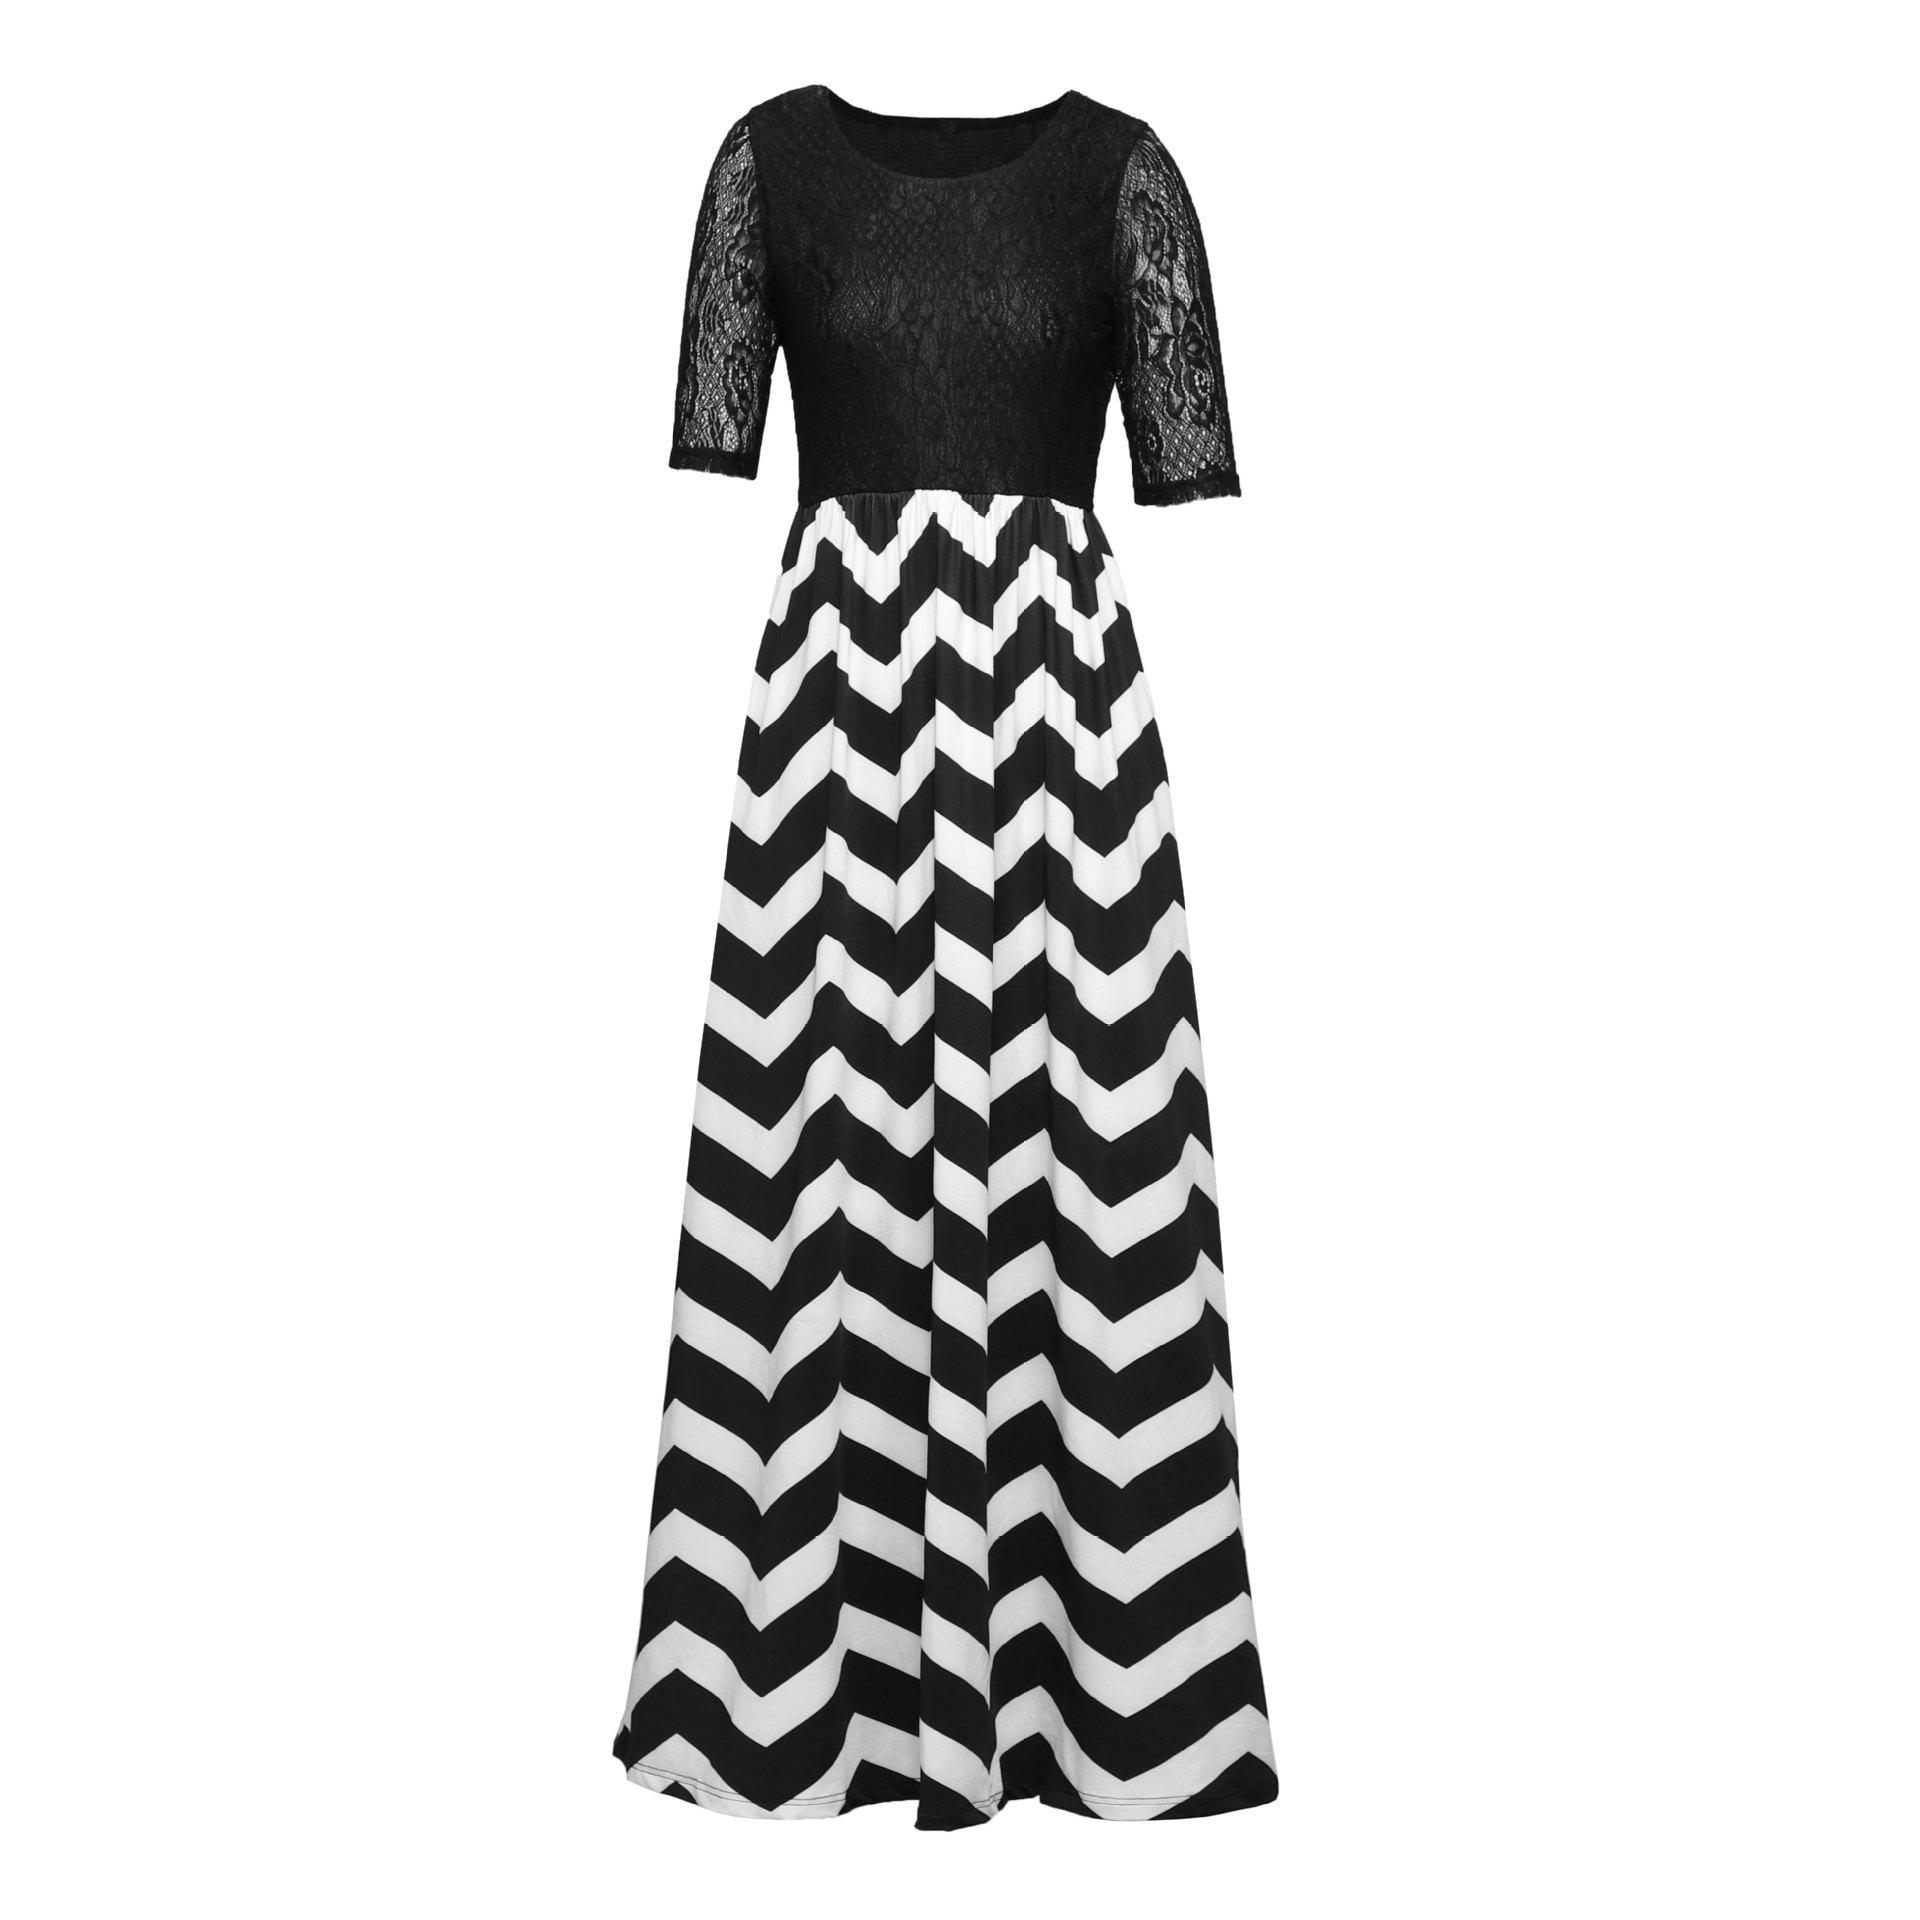 2019wish欧洲站秋季新款黑白条纹蕾丝拼接圆领中袖长款连衣沙滩裙